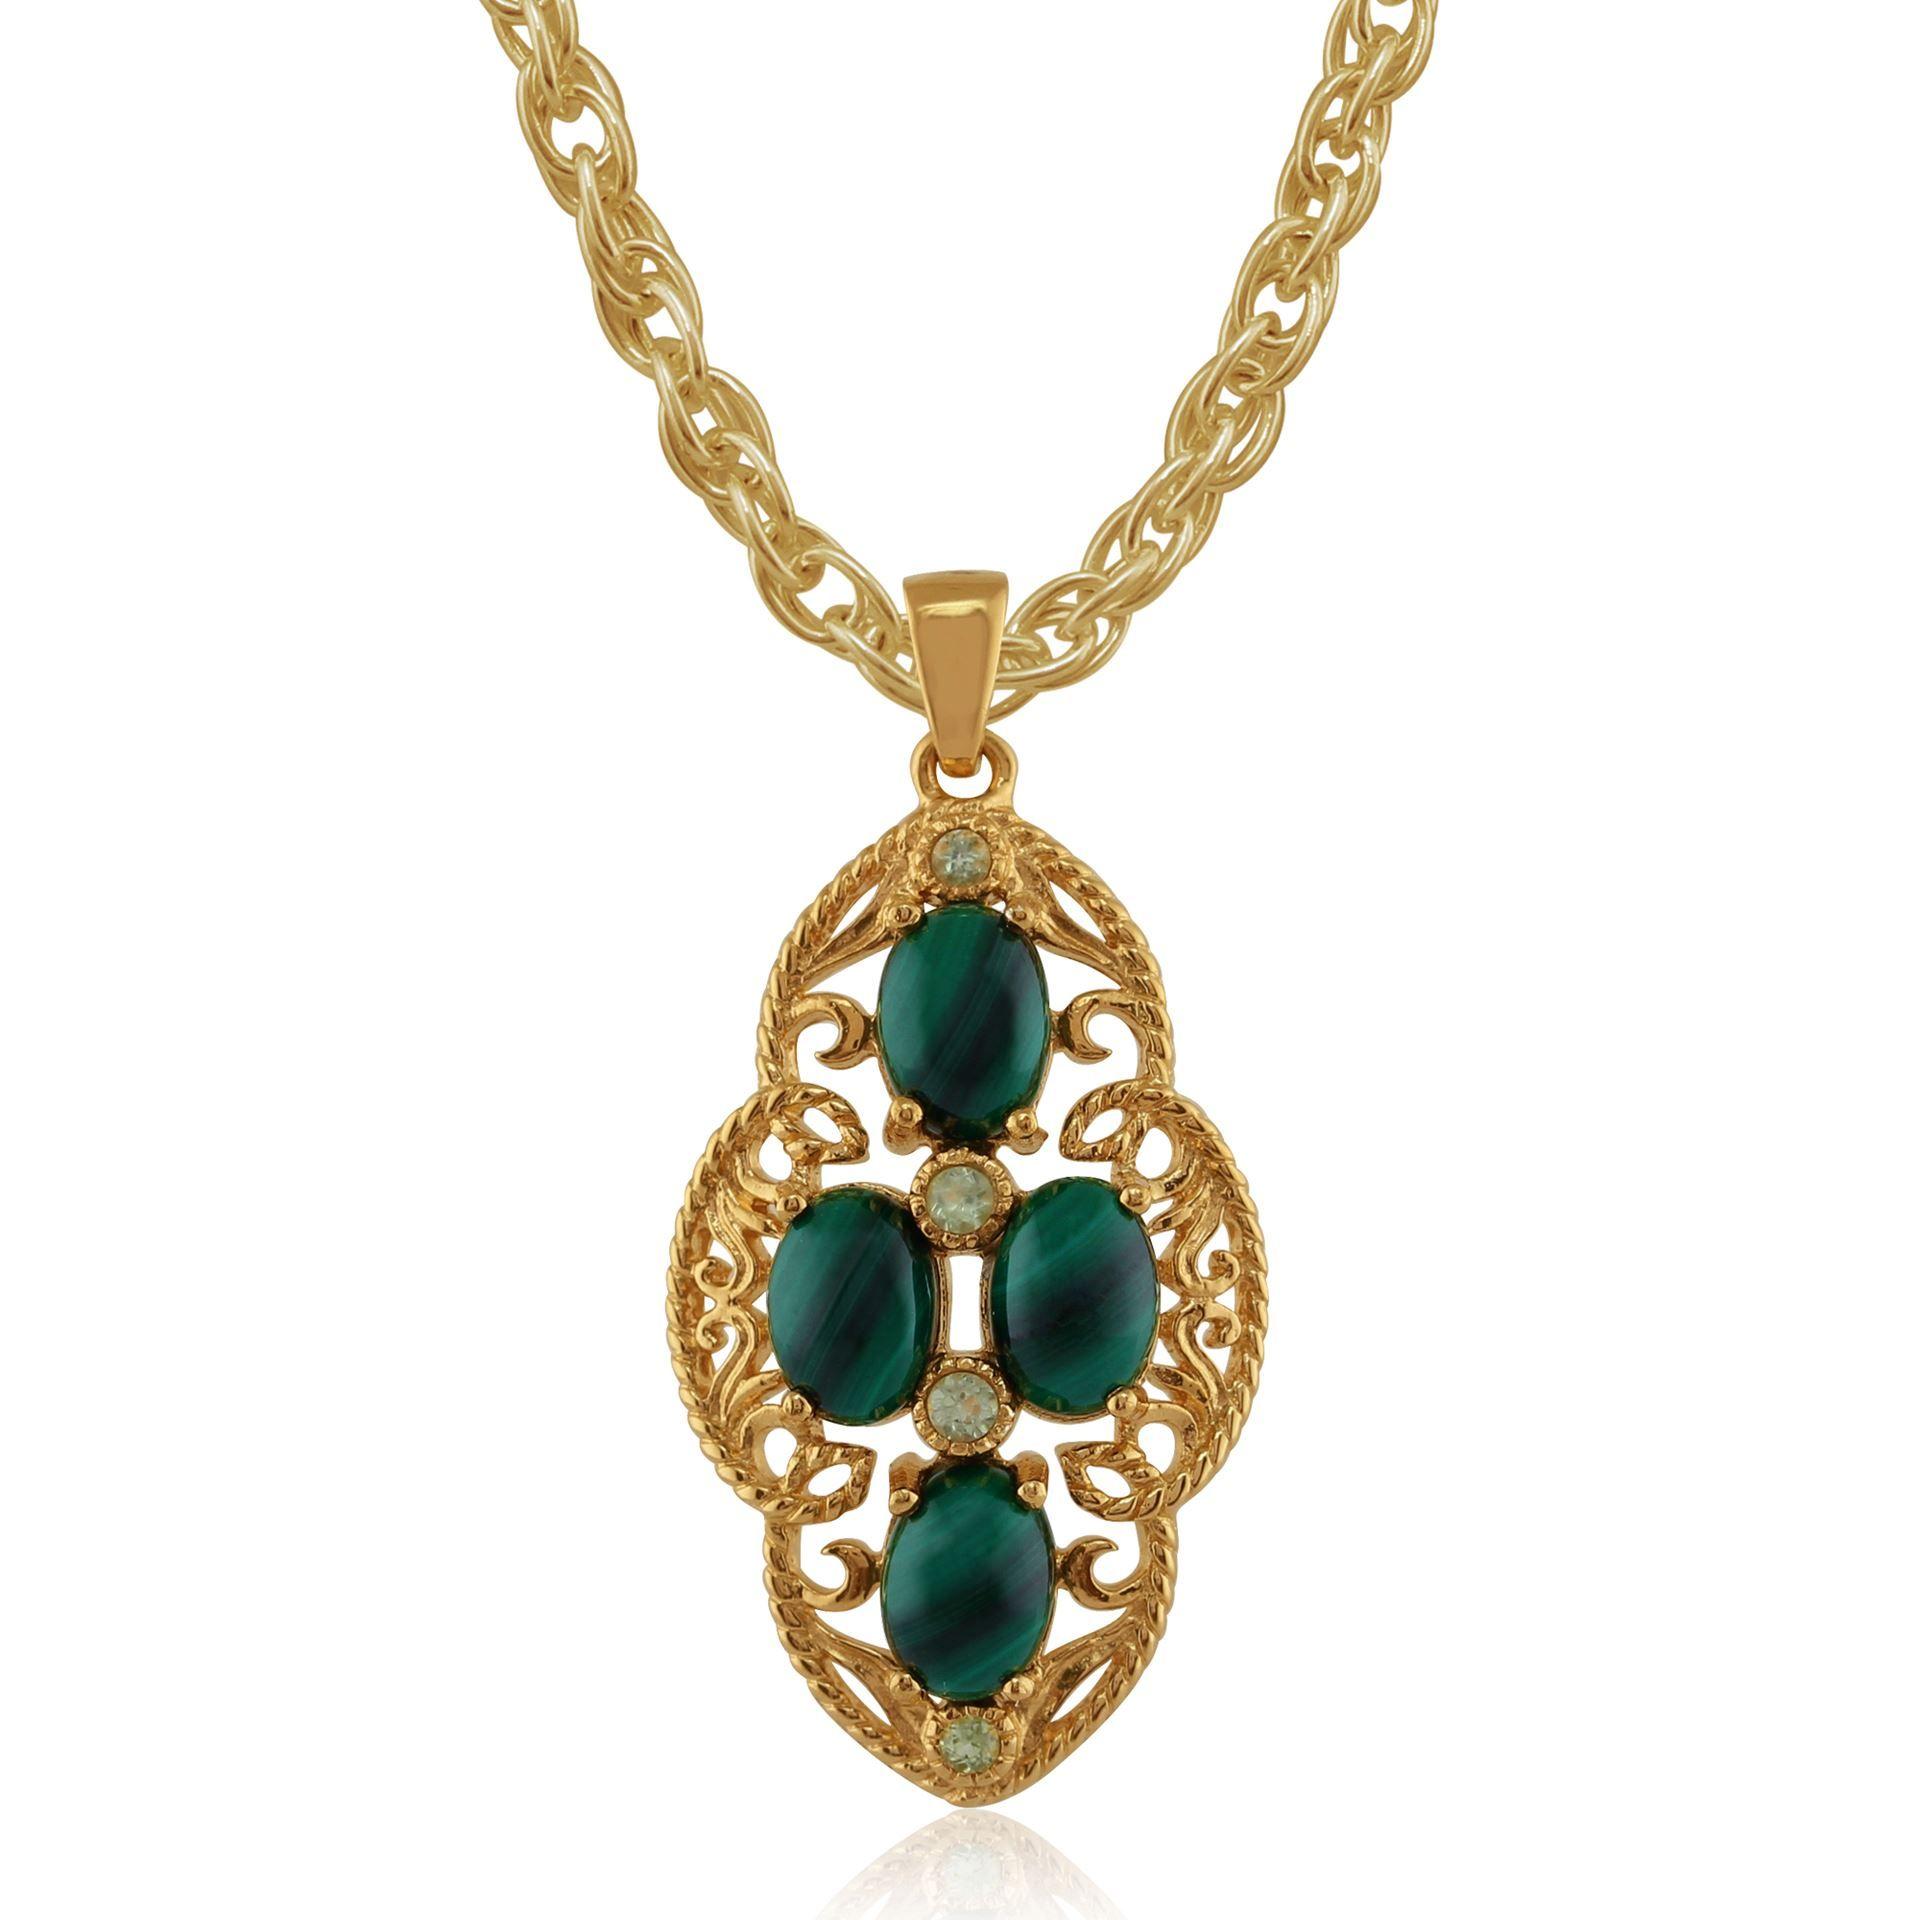 Gemondo Emerald Claddagh Style Cross, 9ct Yellow Gold 0.10ct Emerald Pendant on 45cm Chain